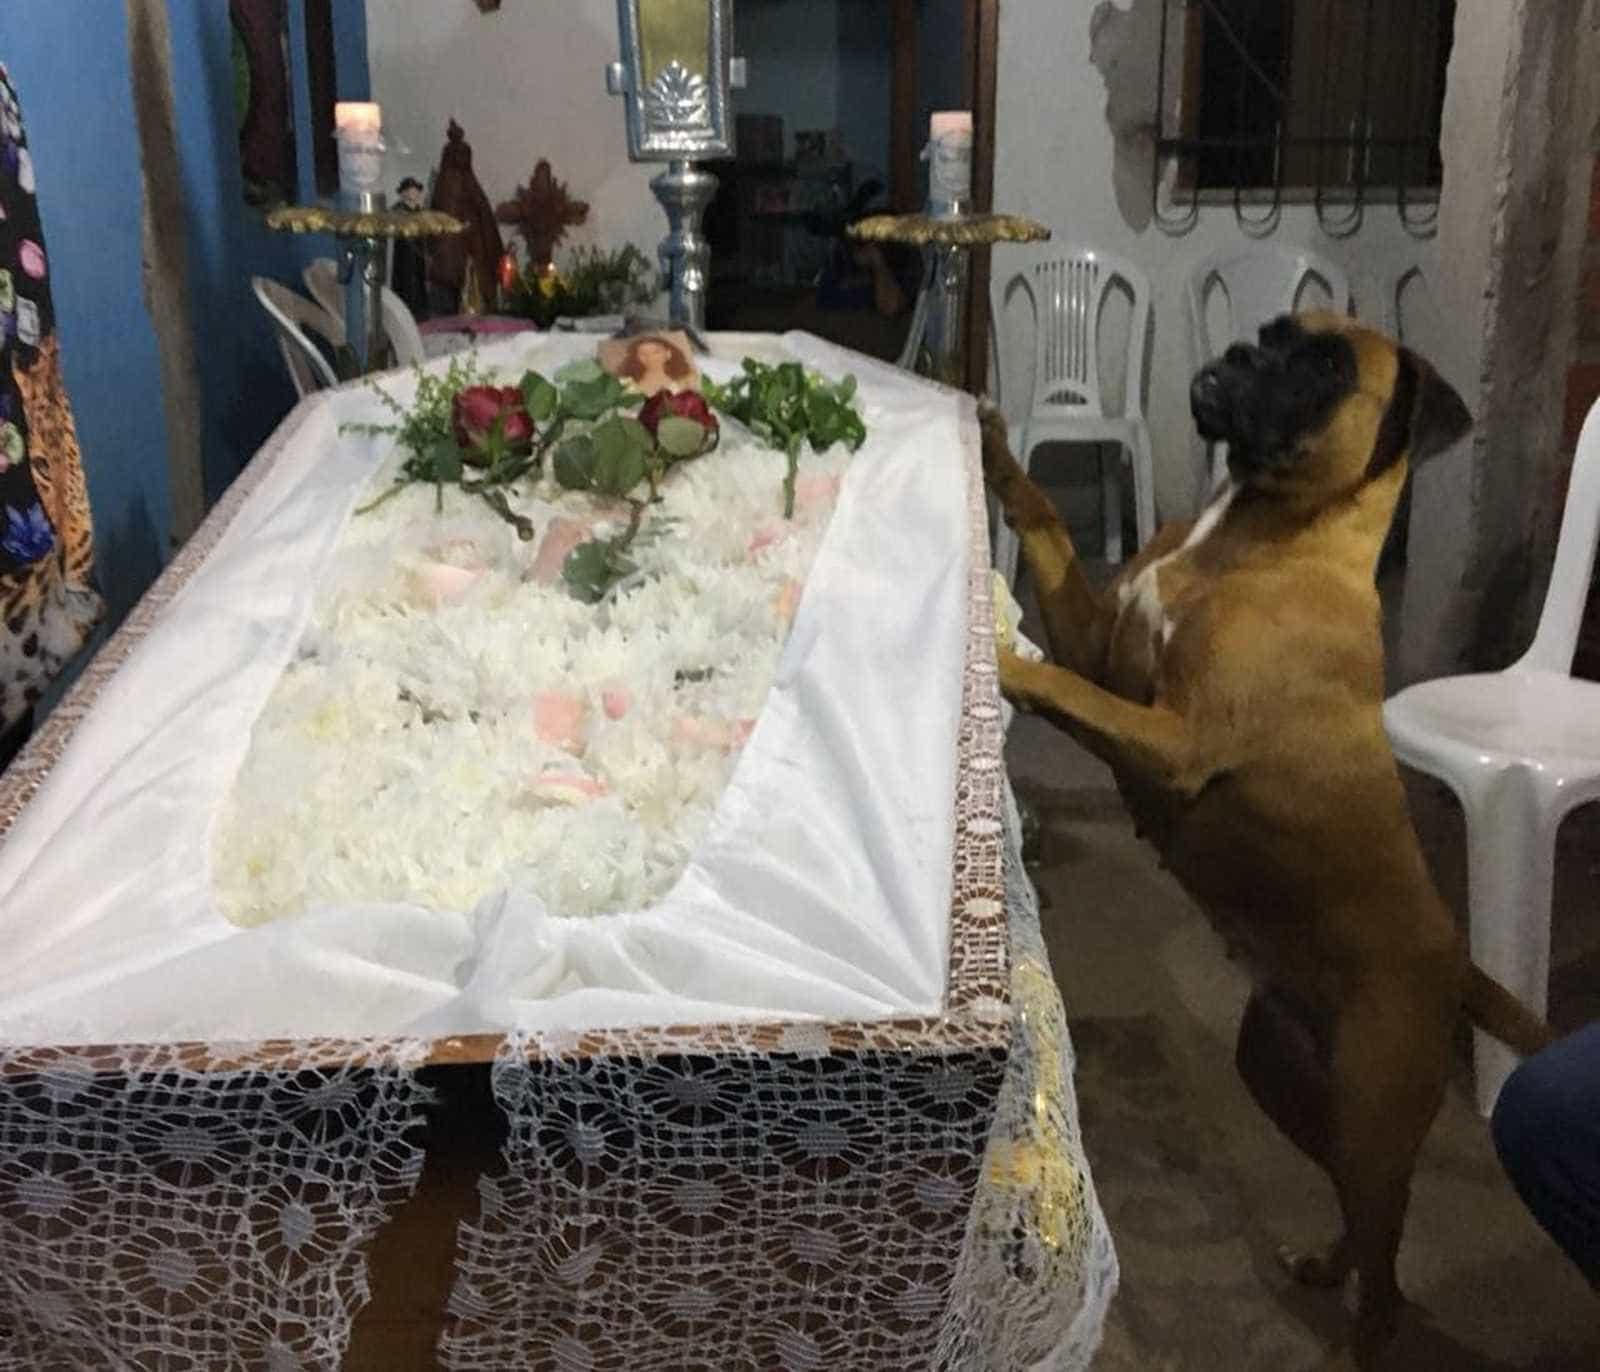 Cachorro impressiona familiares ao velar corpo da dona